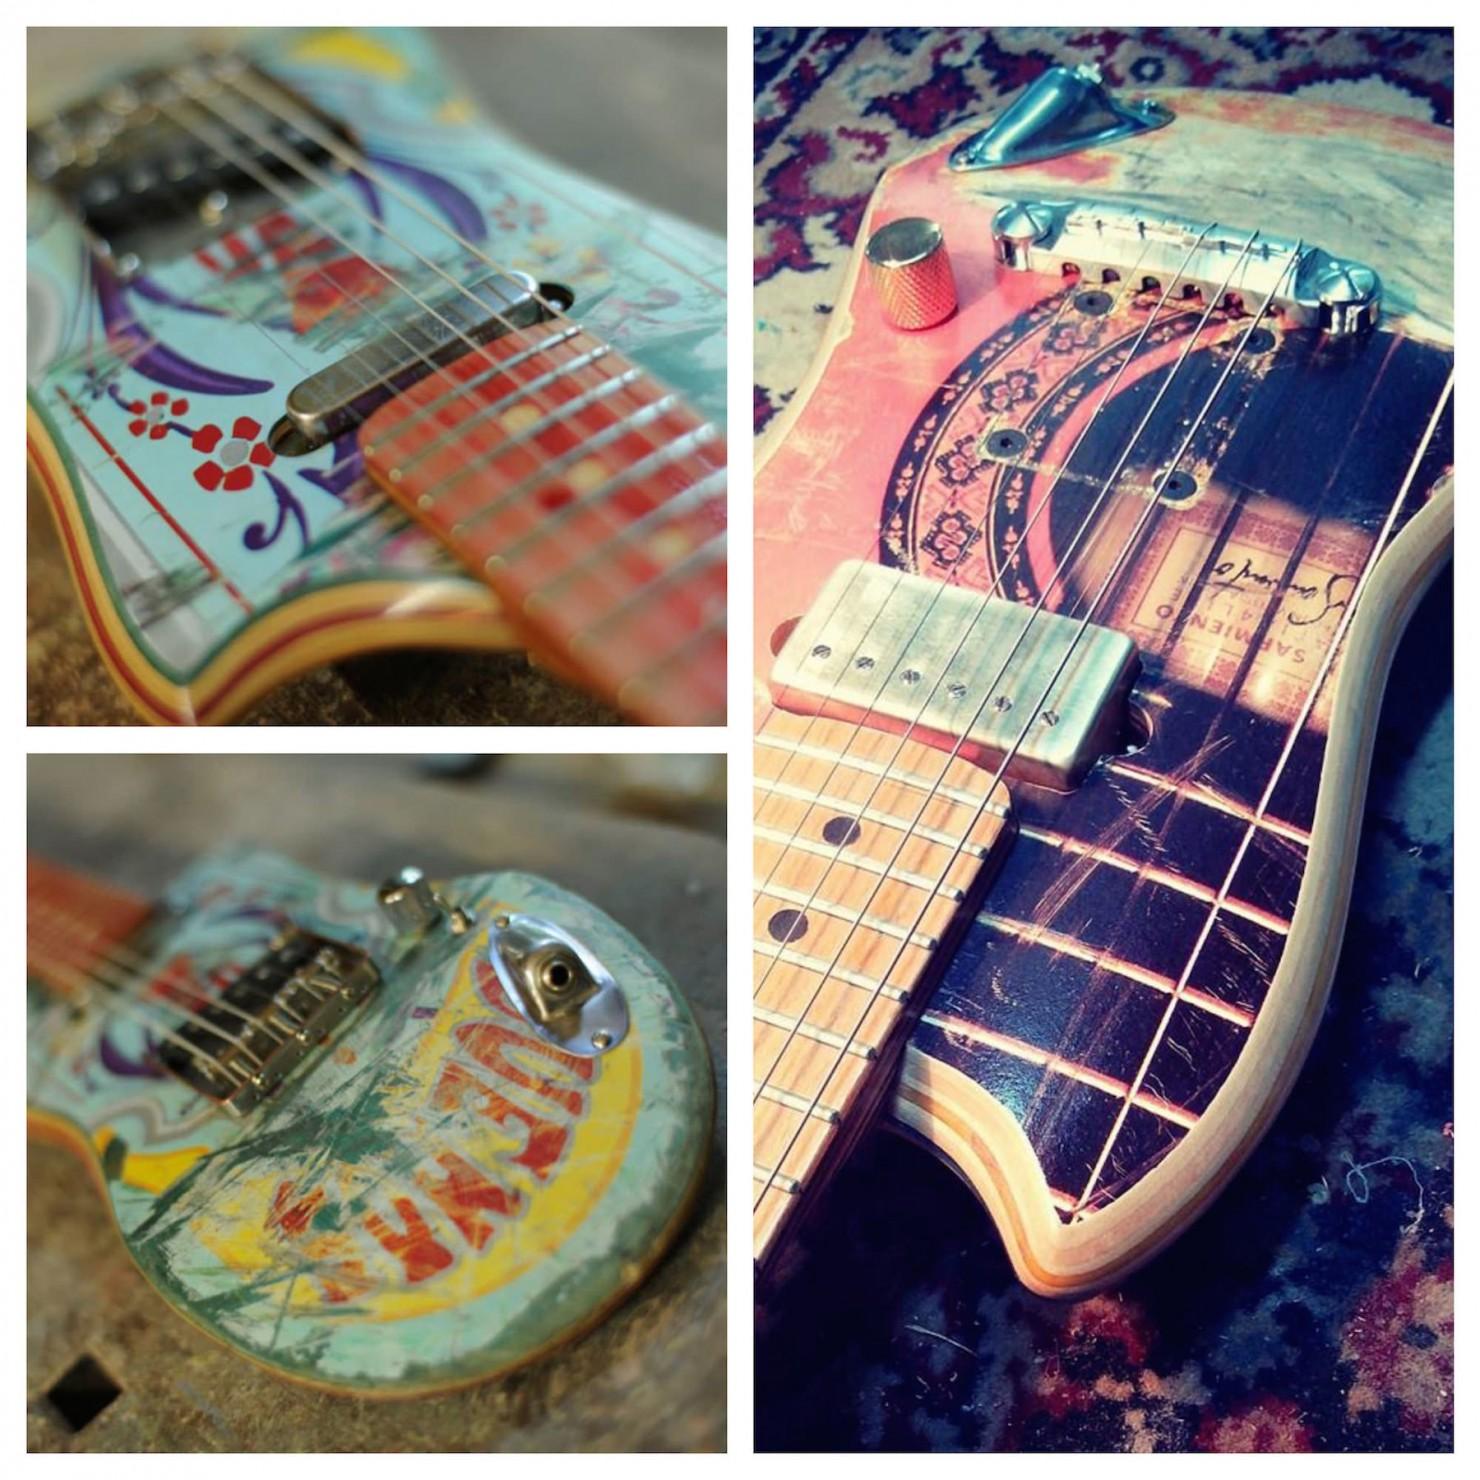 Skateboard_Guitars_1_Fotor_Collage_2